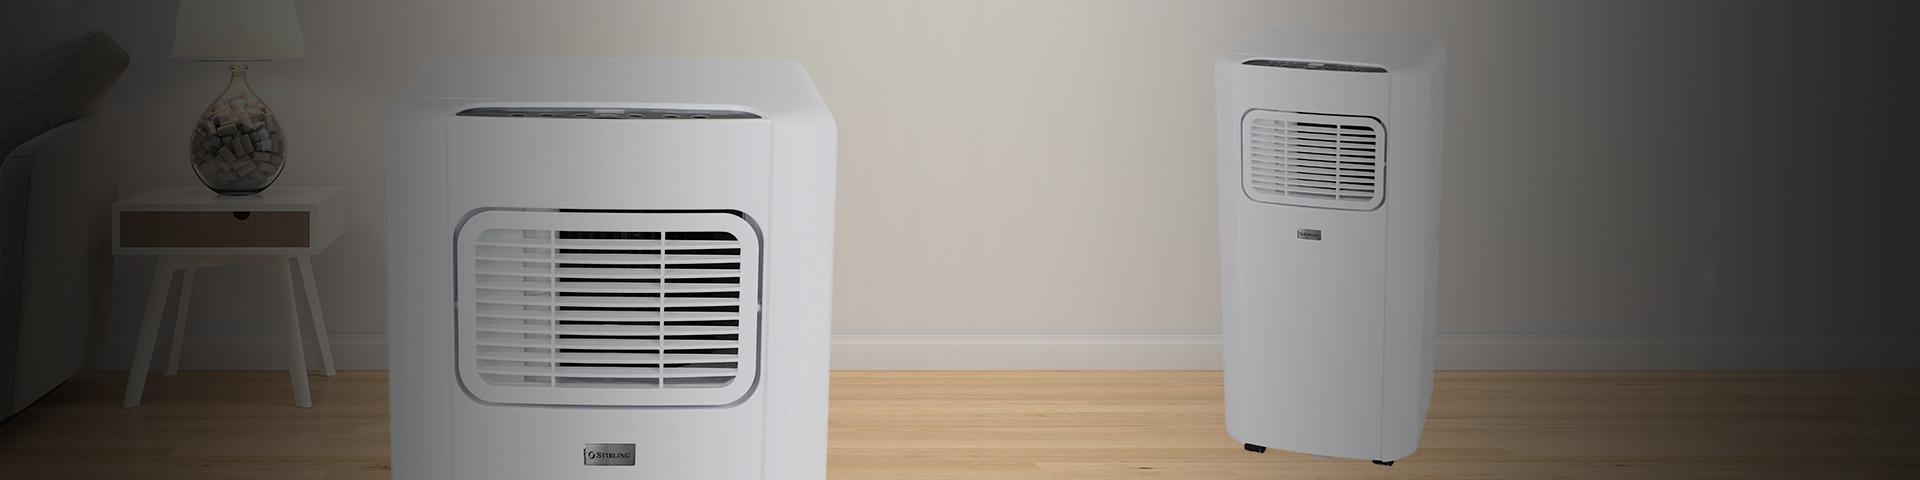 http://www.stirlingappliances.com.au/